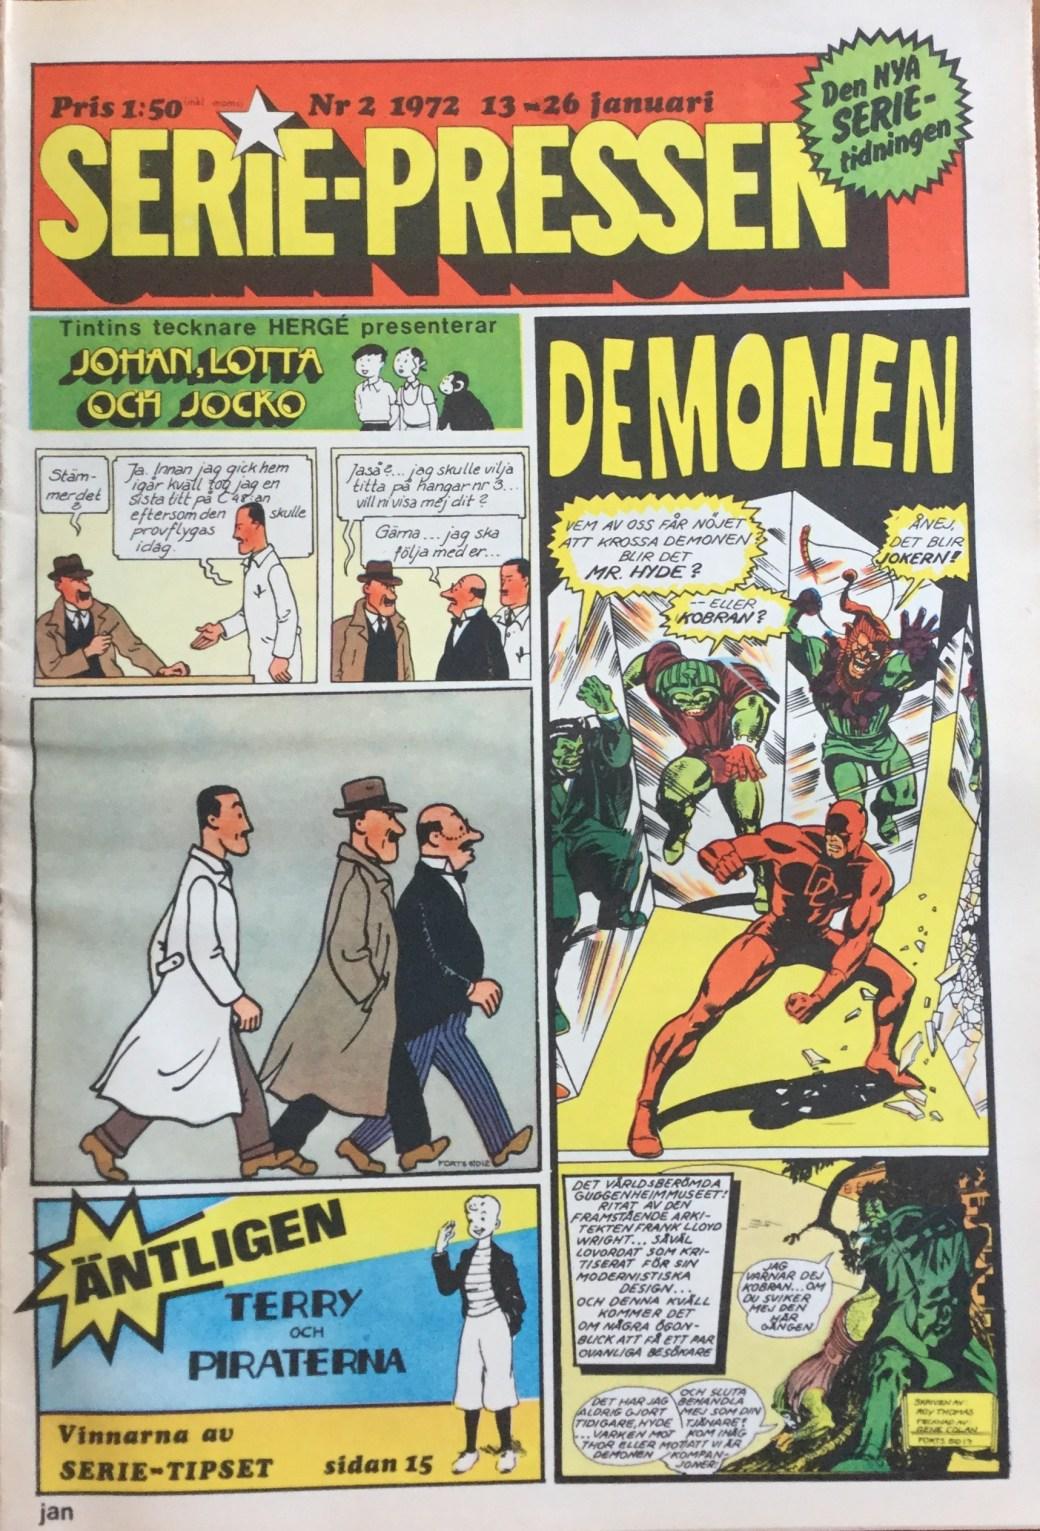 Serie-Pressen nr 2, 1972